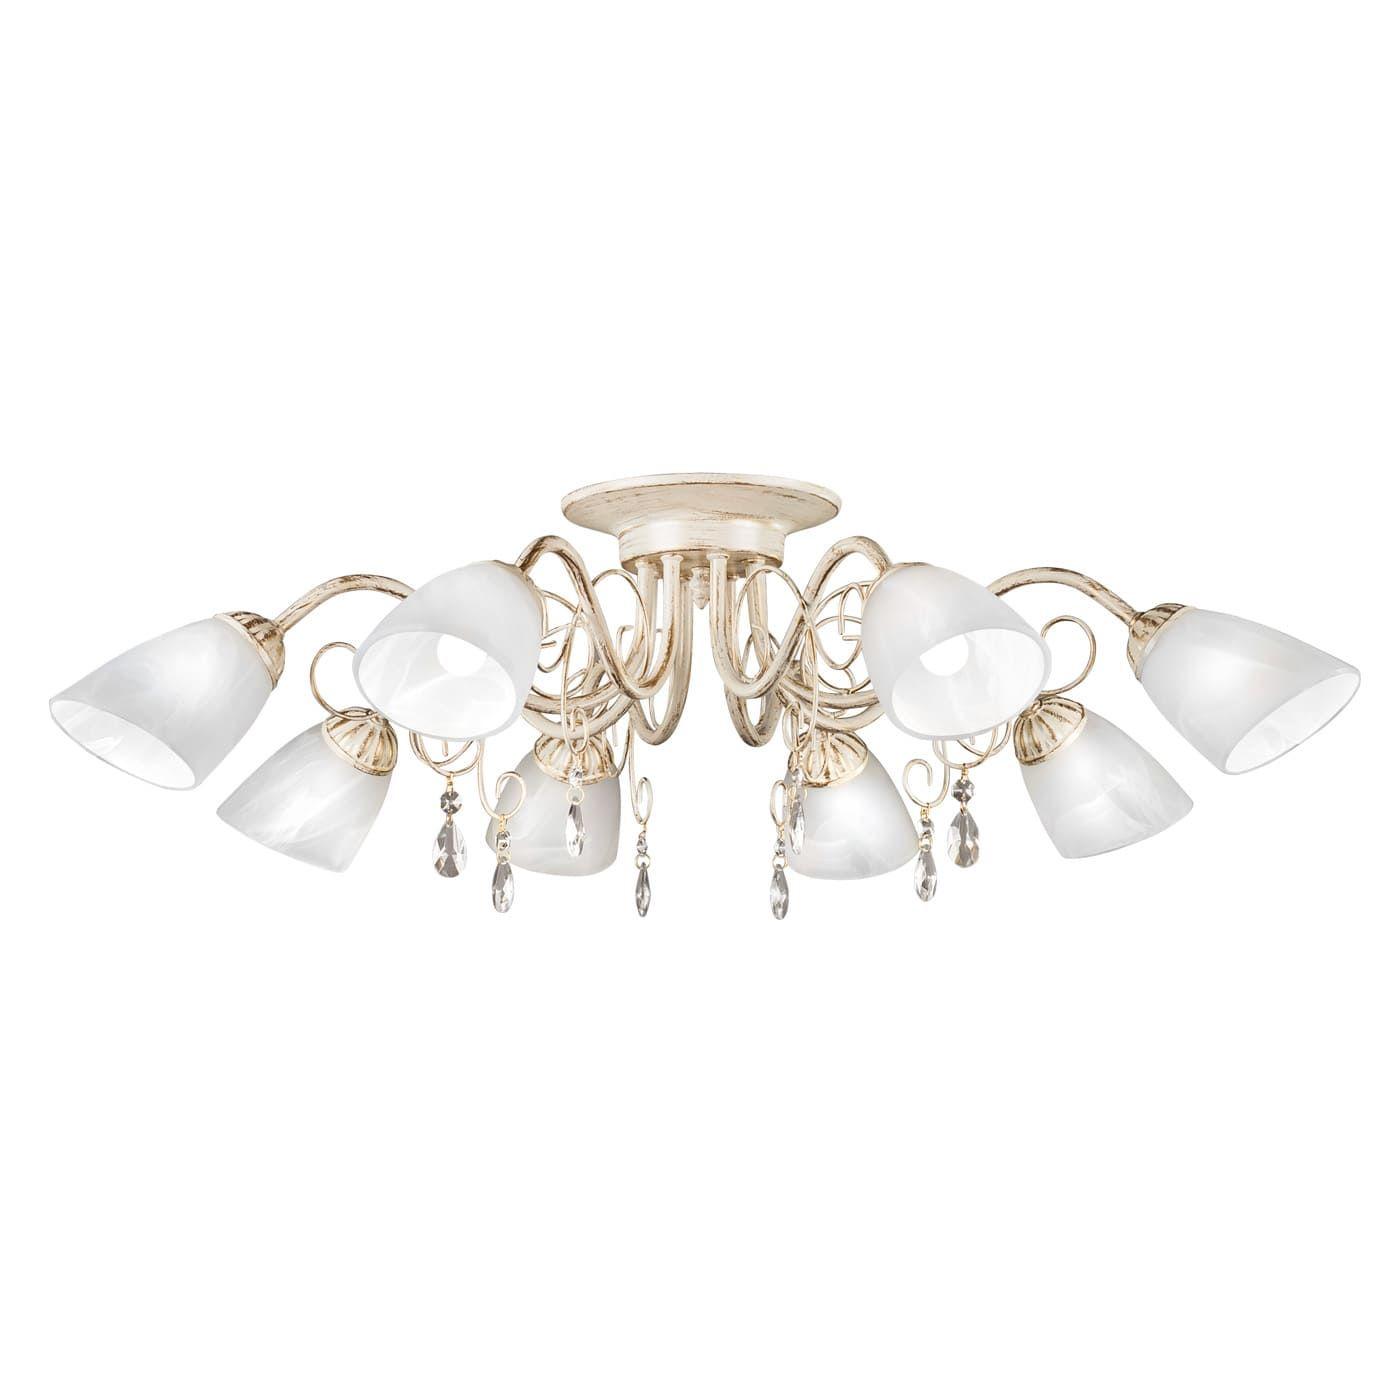 PETRASVET / Ceiling chandelier S2019-8, 8xE14 max. 60W